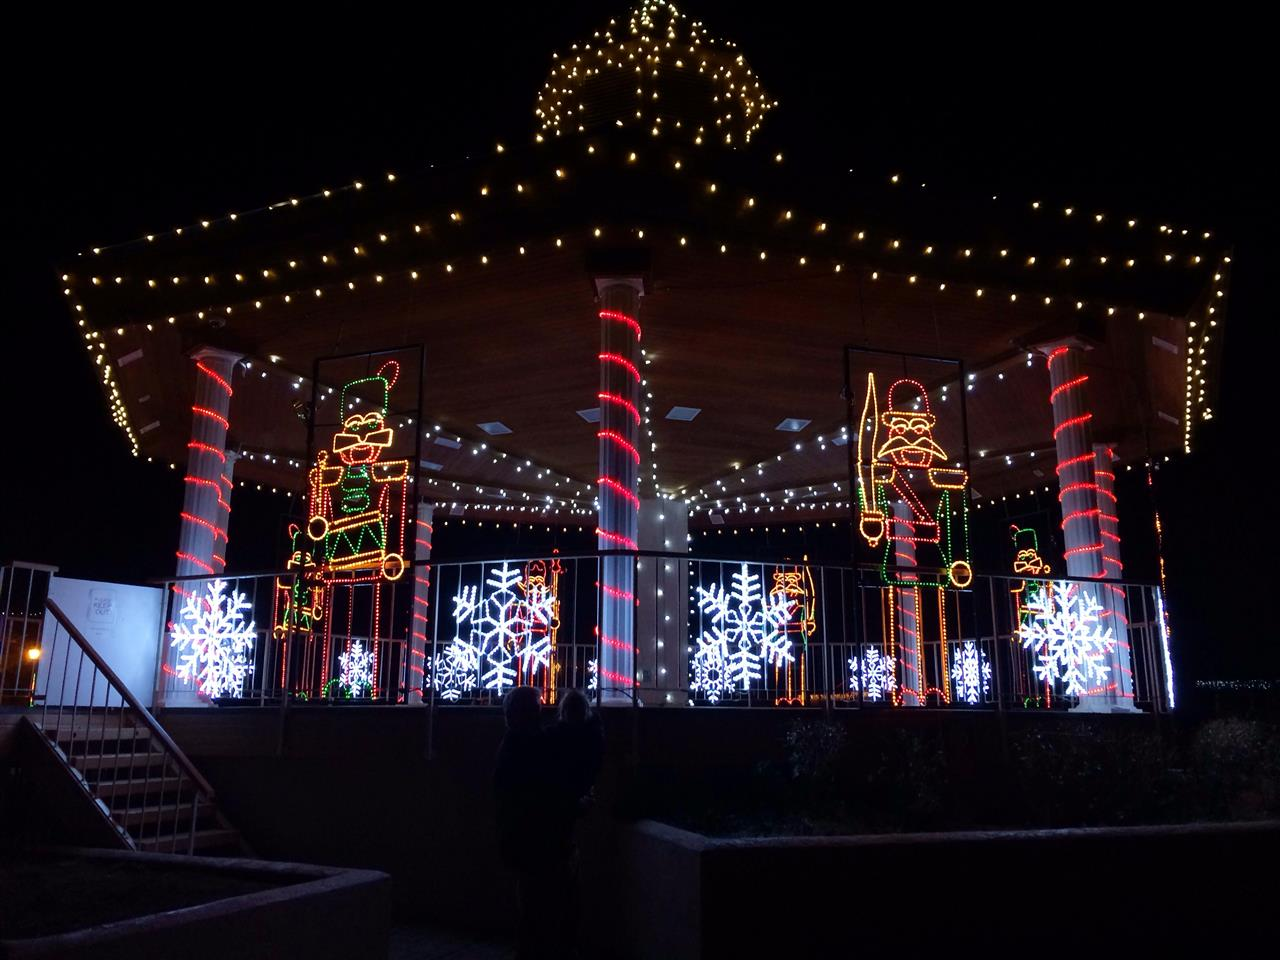 #Carson Valley, NV #Minden Holiday Decorations